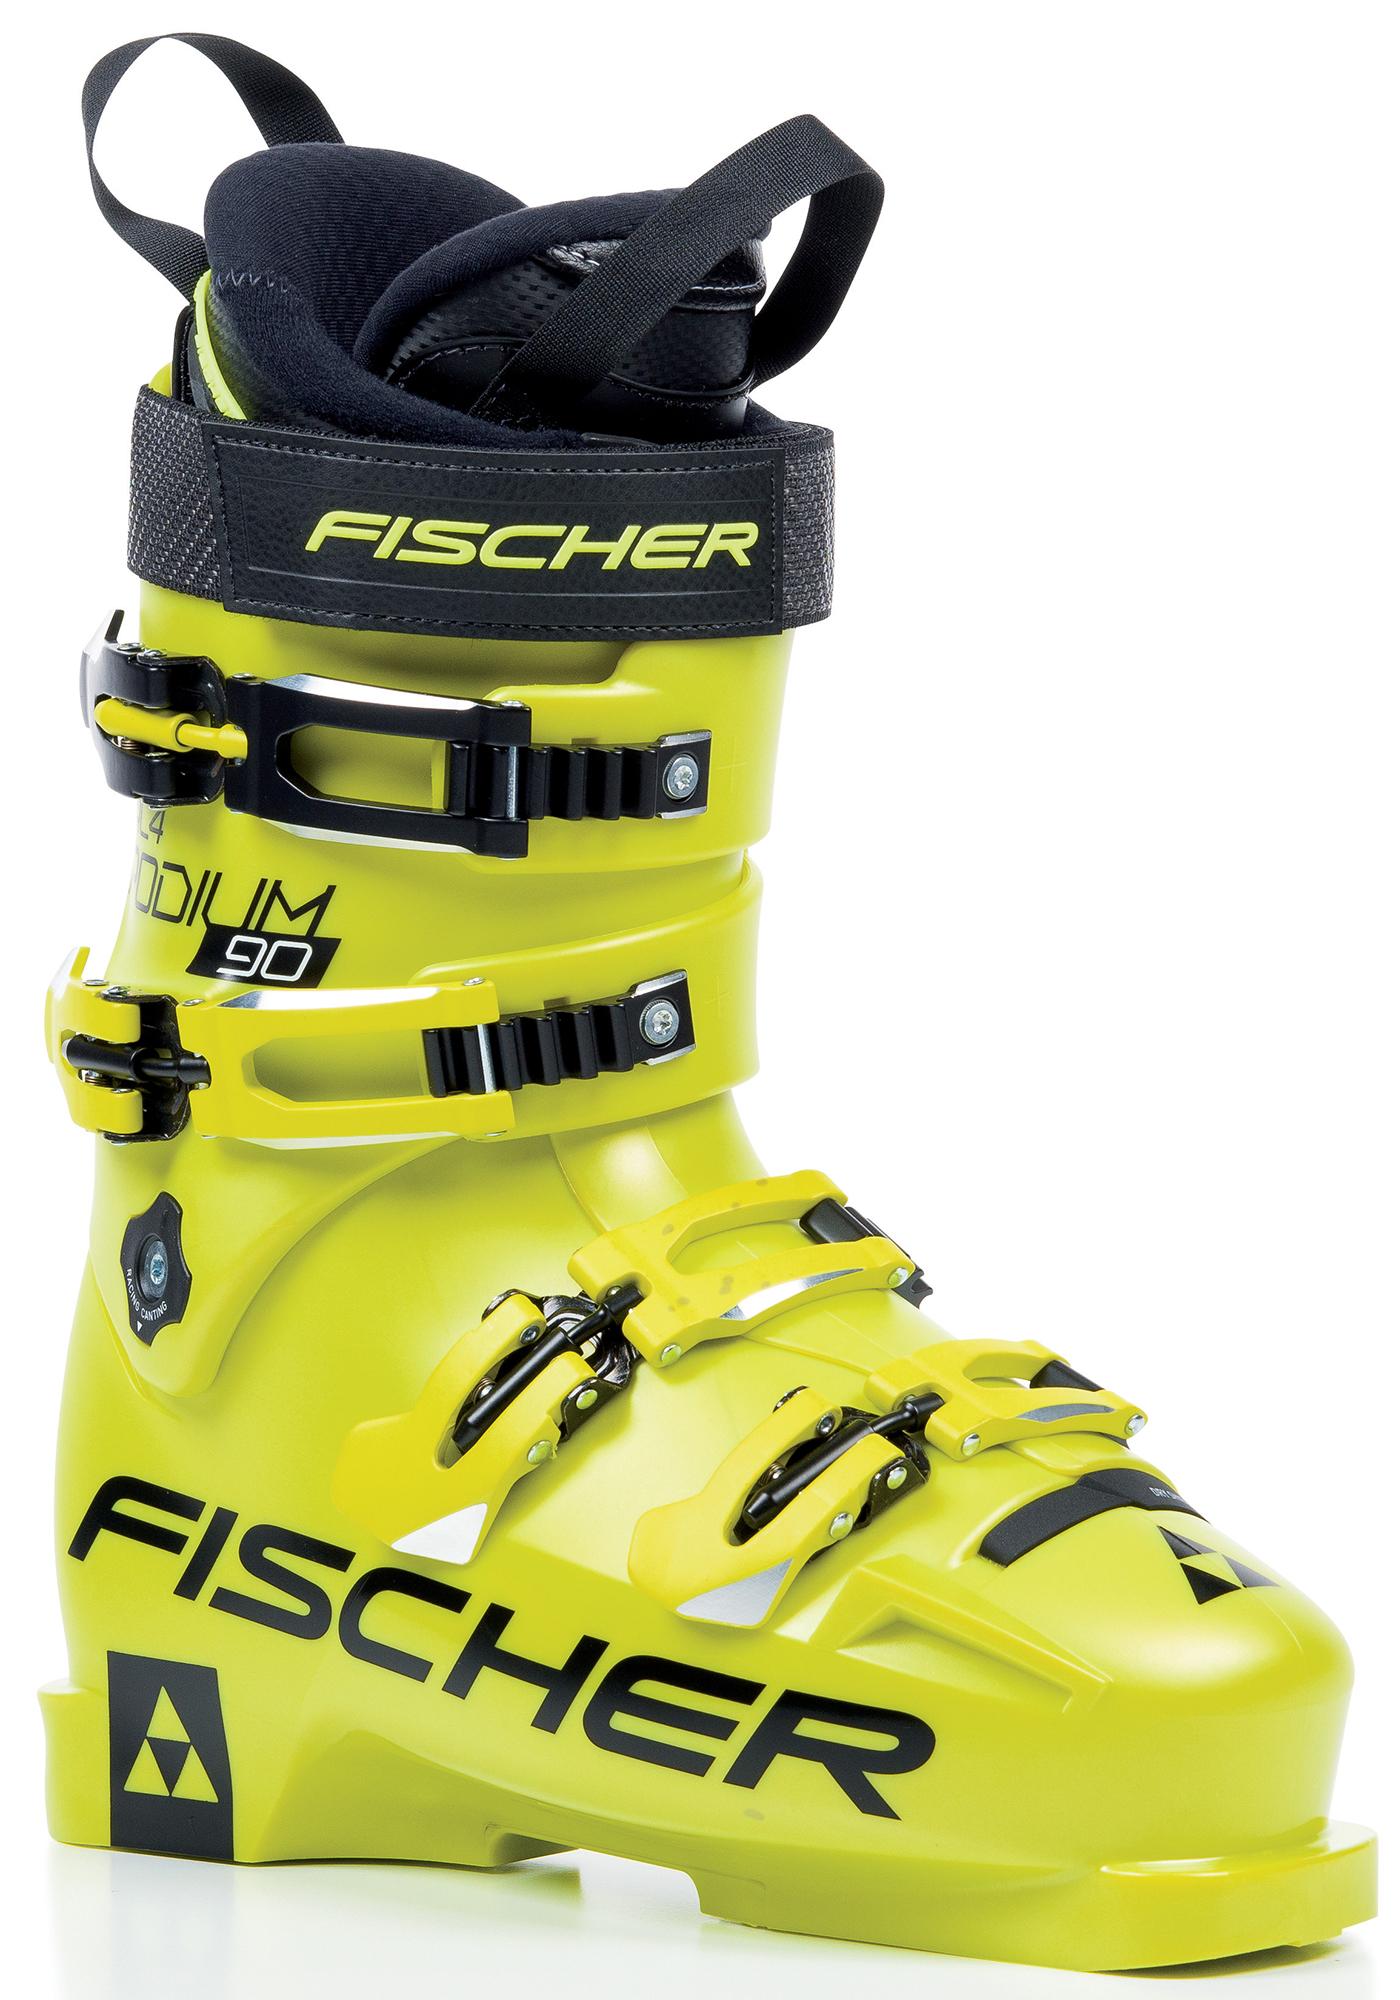 Fischer Ботинки горнолыжные детские Fischer RC4 Podium 90, размер 39.5